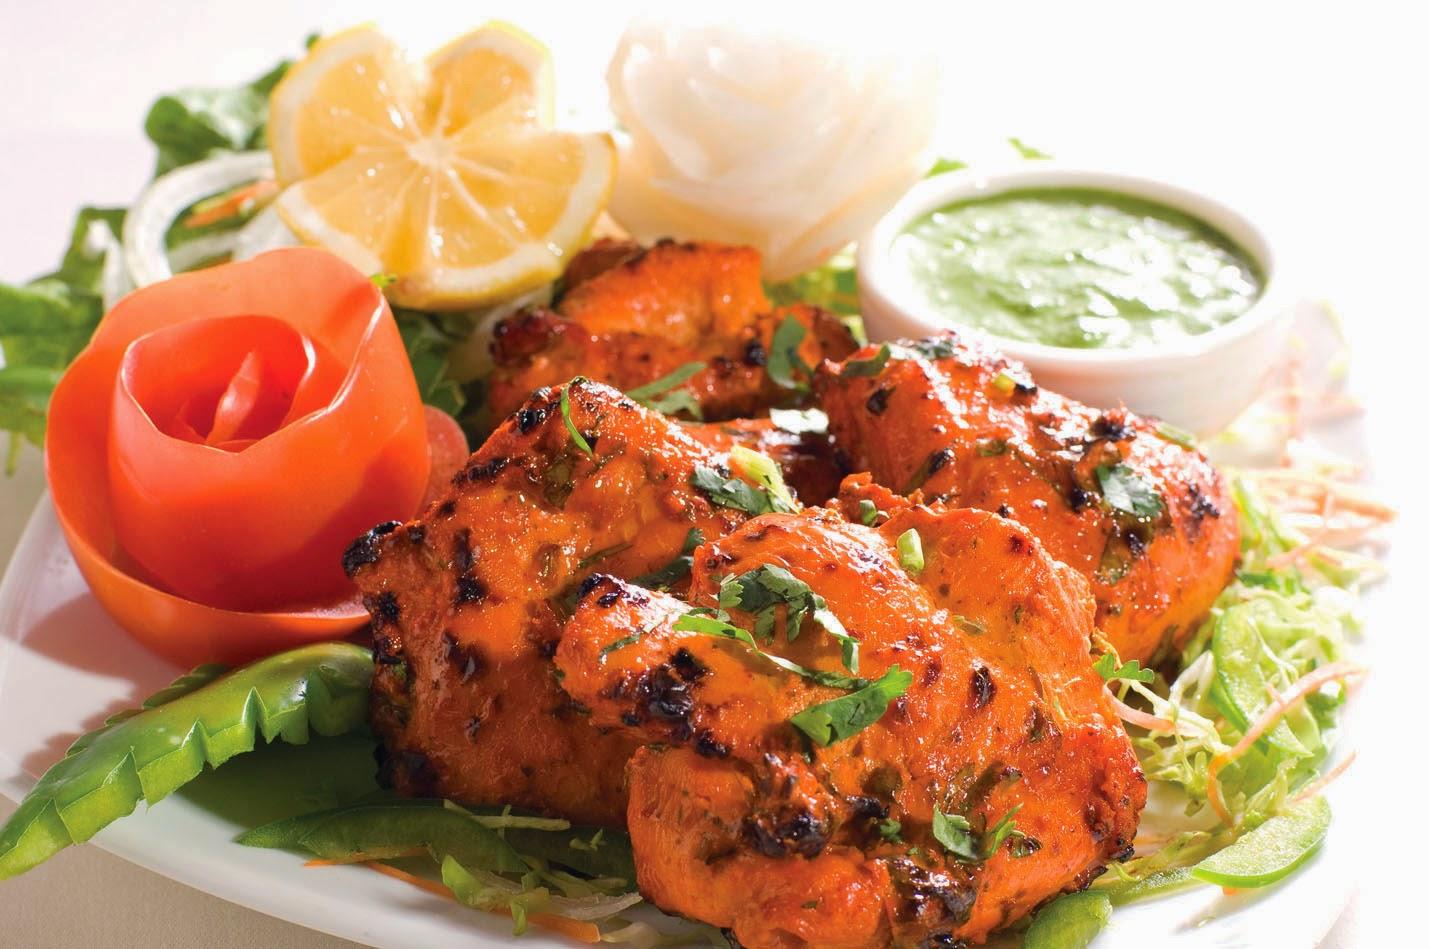 Family Indian Restaurant: Chicken tikka